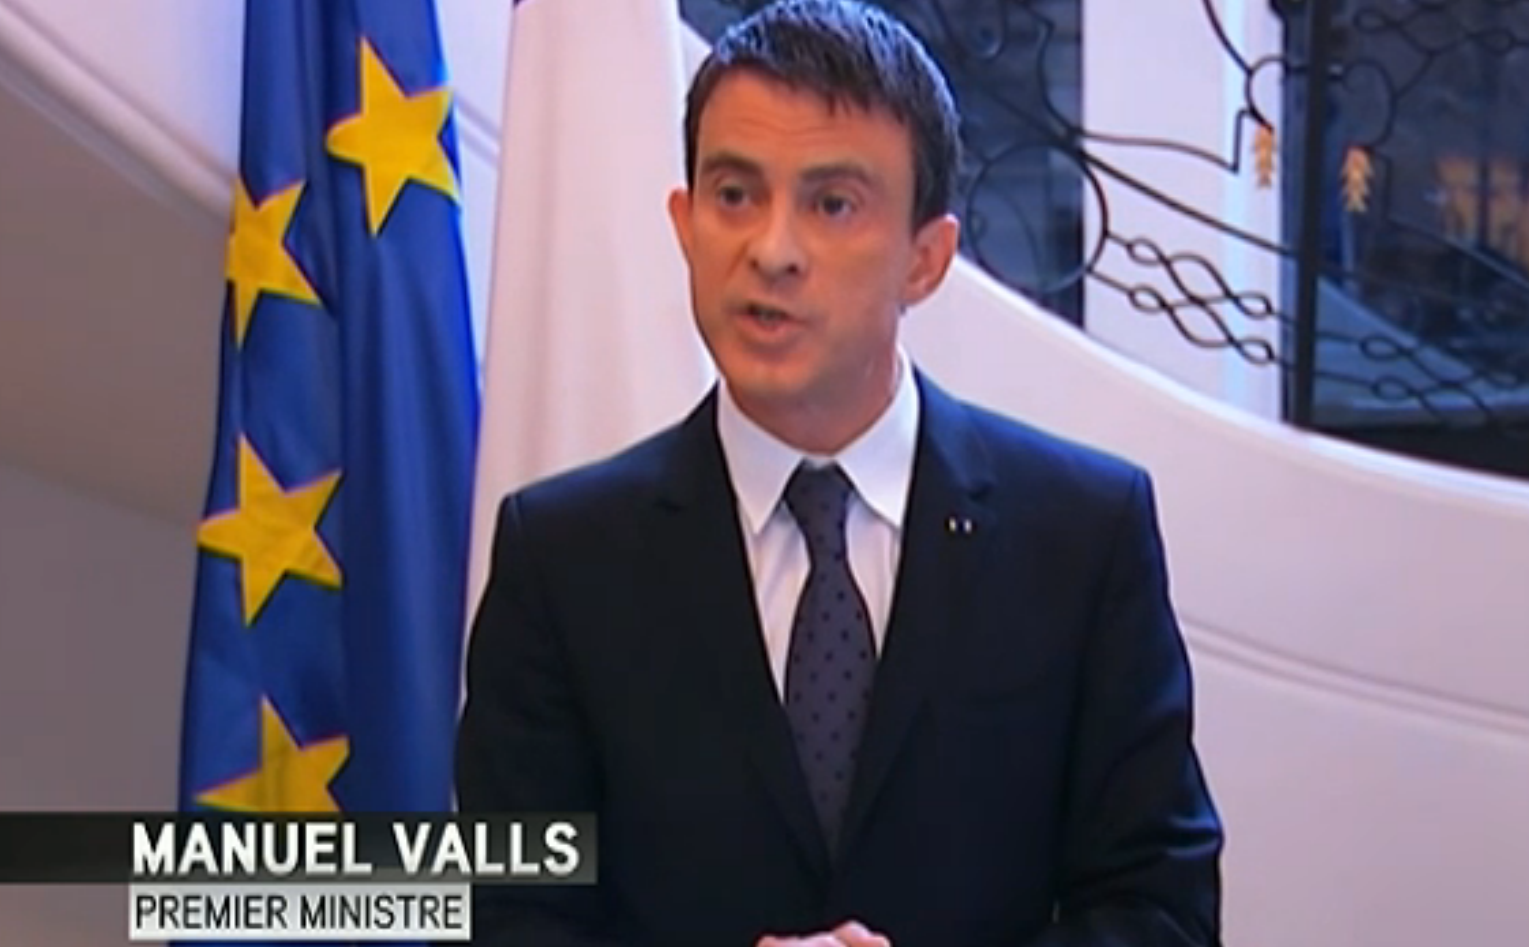 France's PM Manuel Valls